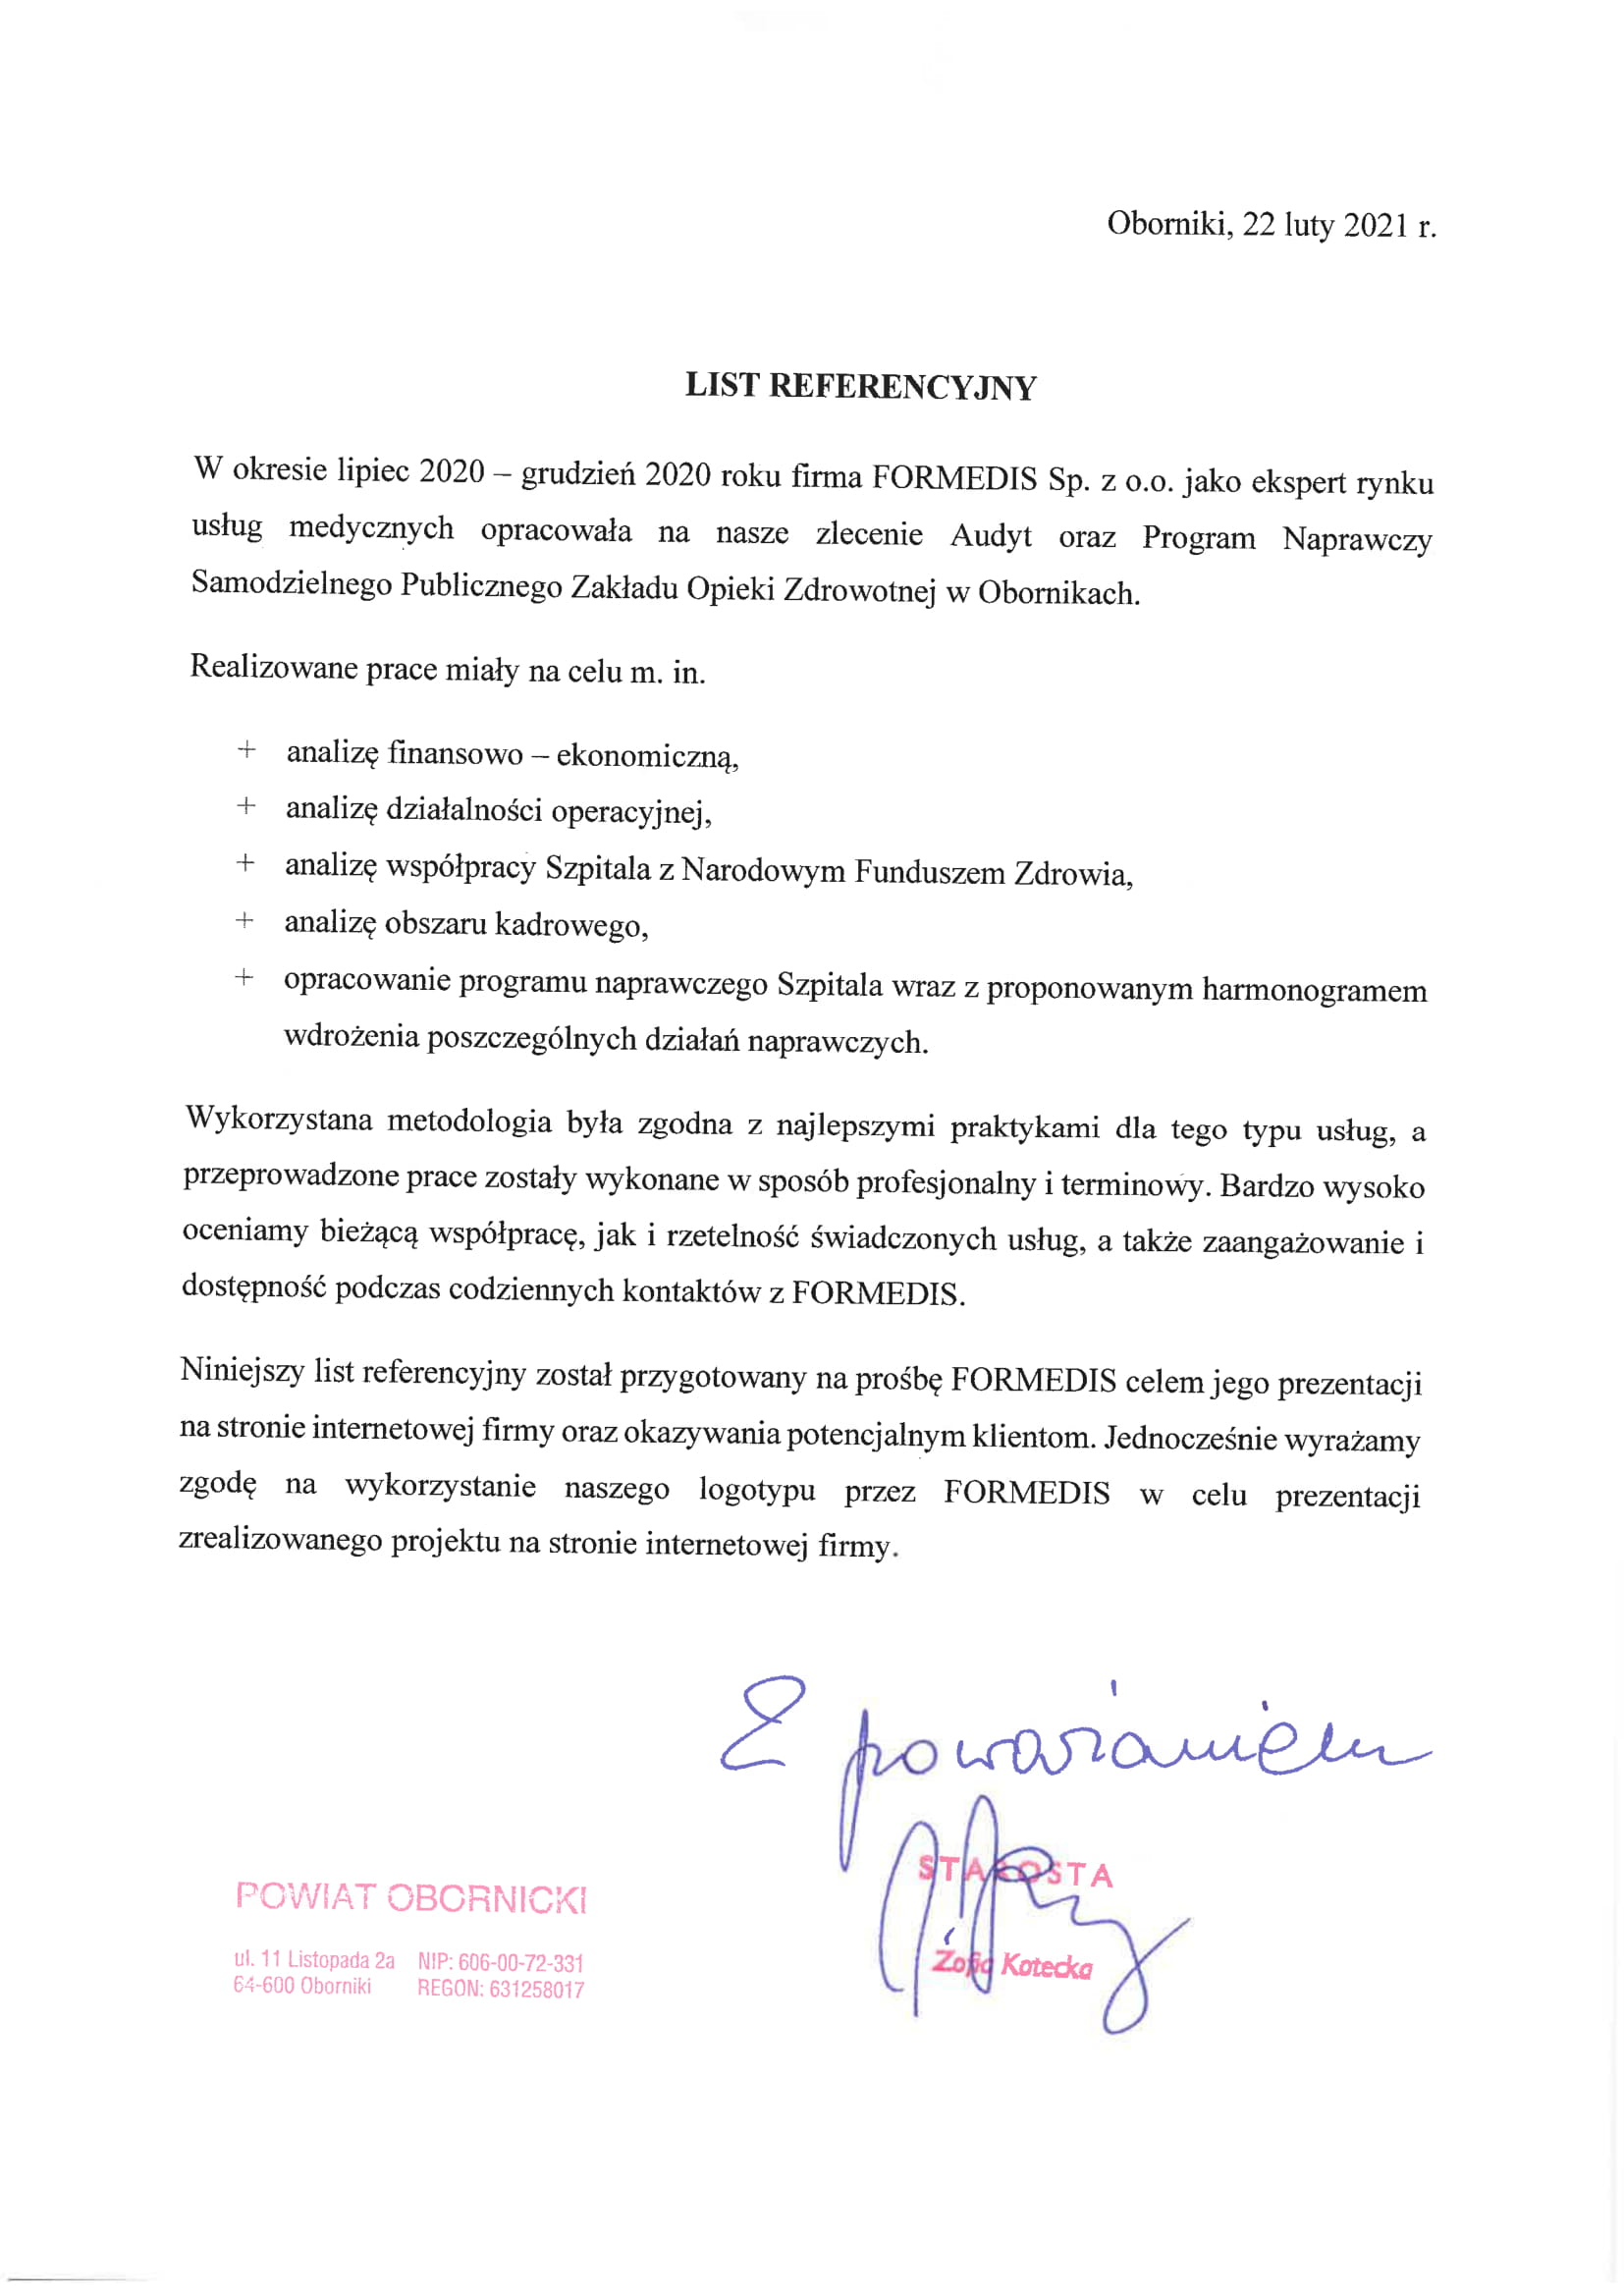 List referencyjny Oborniki-1